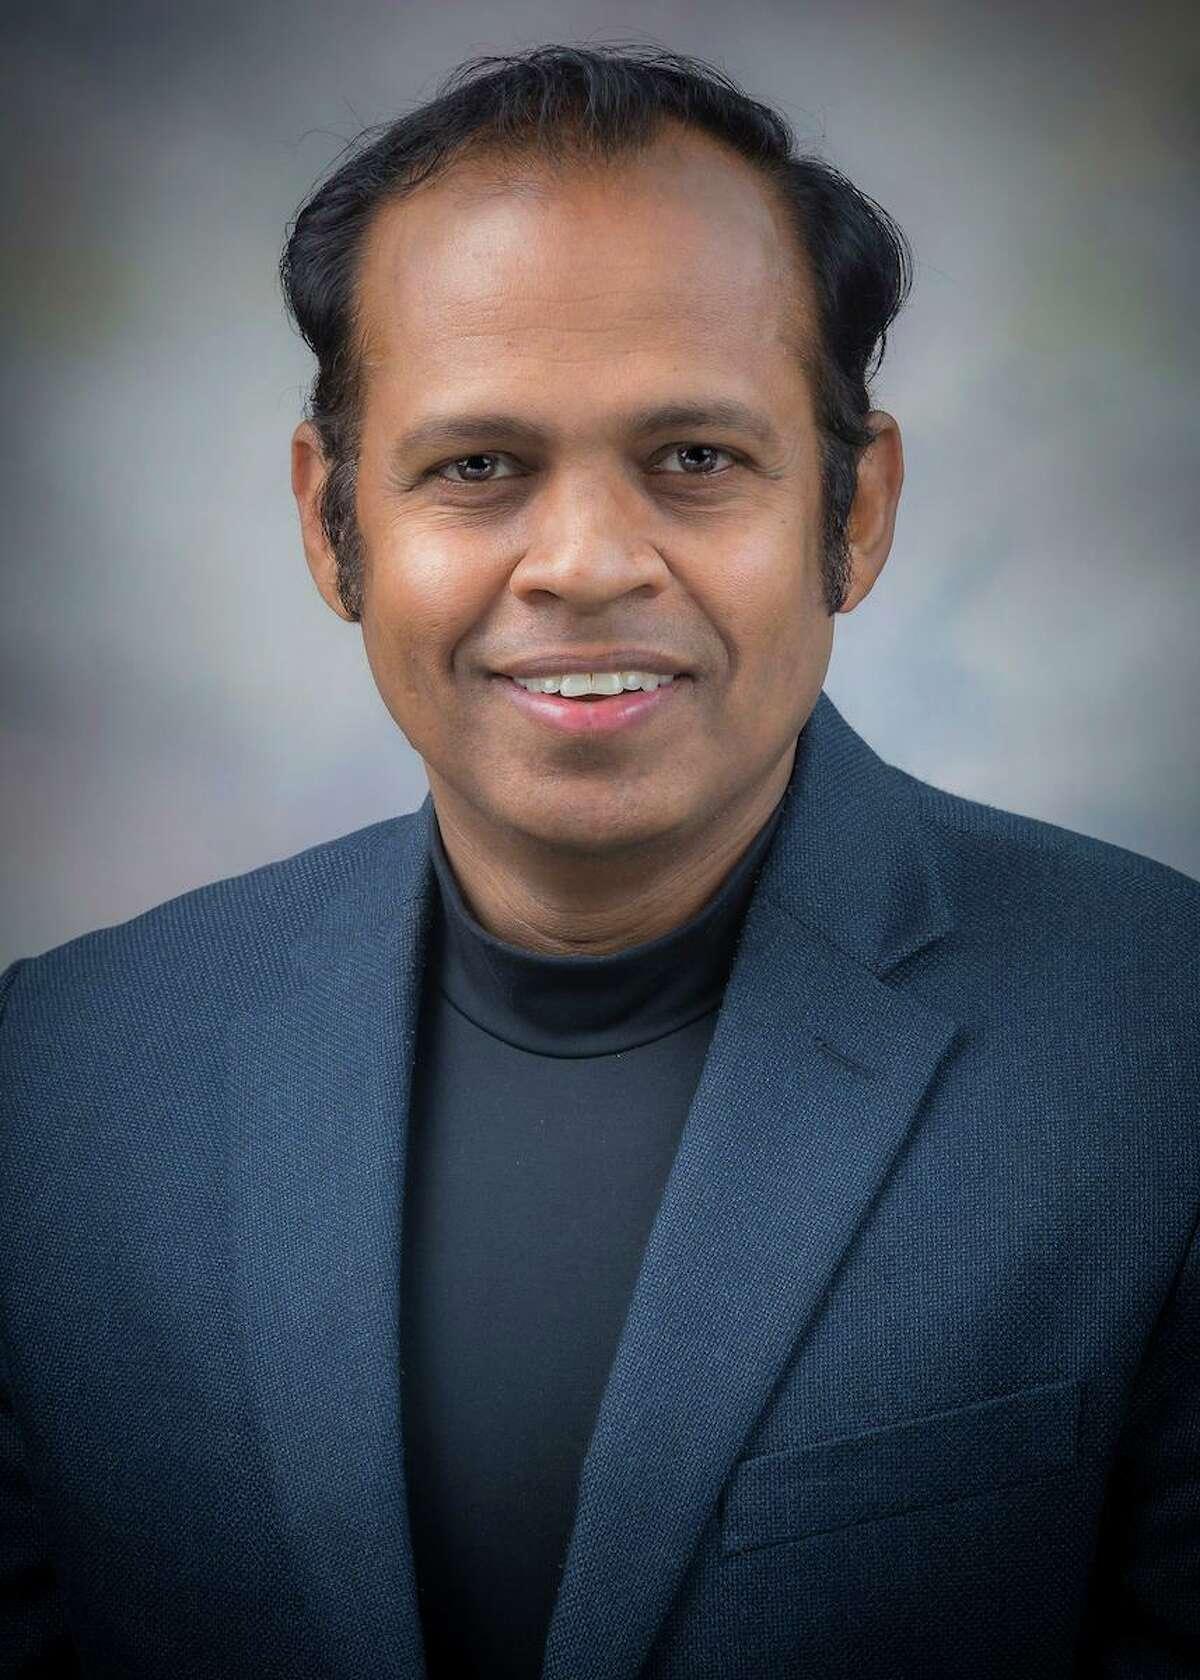 Madesh Muniswamy is a professor and researcher at UT Health San Antonio.